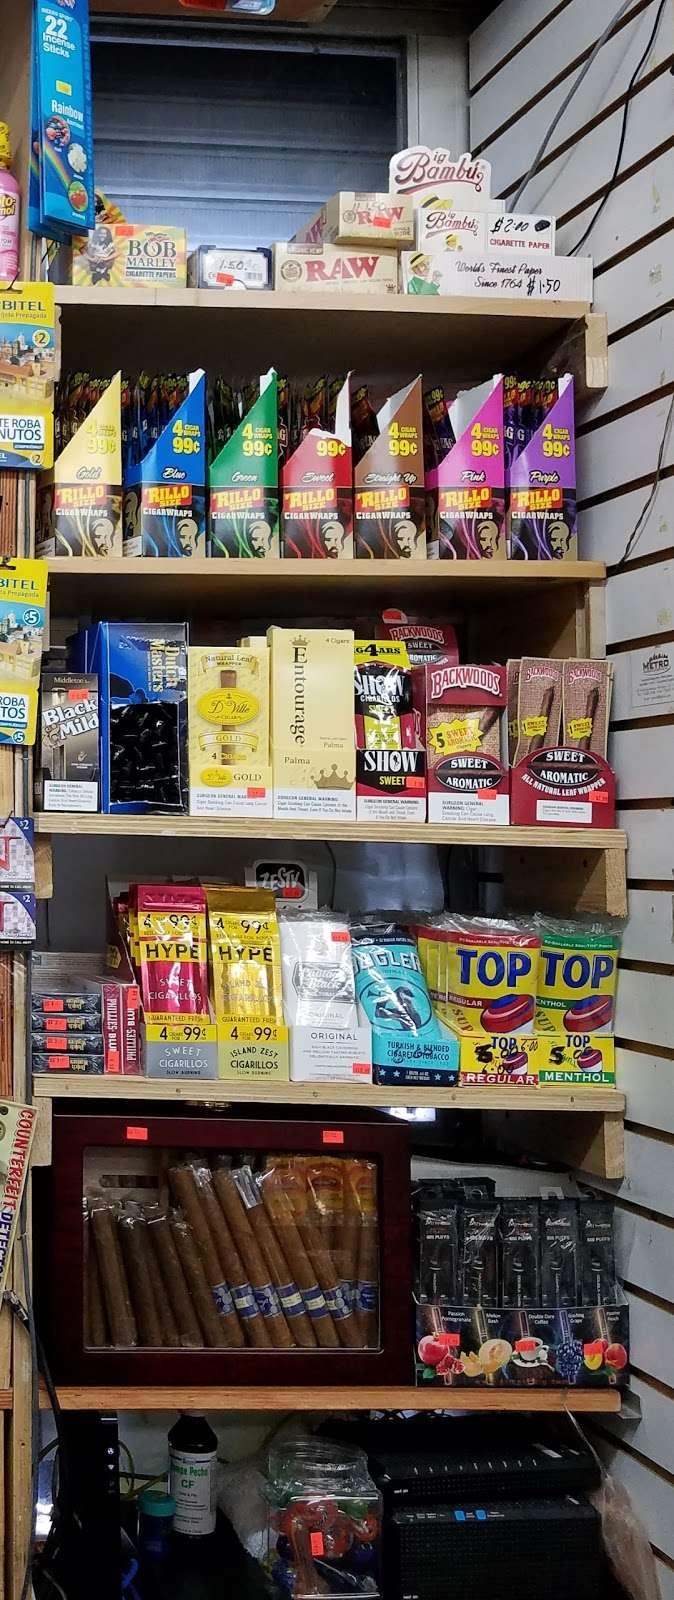 Crystal Corner Deli Grocery - store    Photo 9 of 10   Address: 70-20 Central Ave, Glendale, NY 11385, USA   Phone: (718) 821-6968